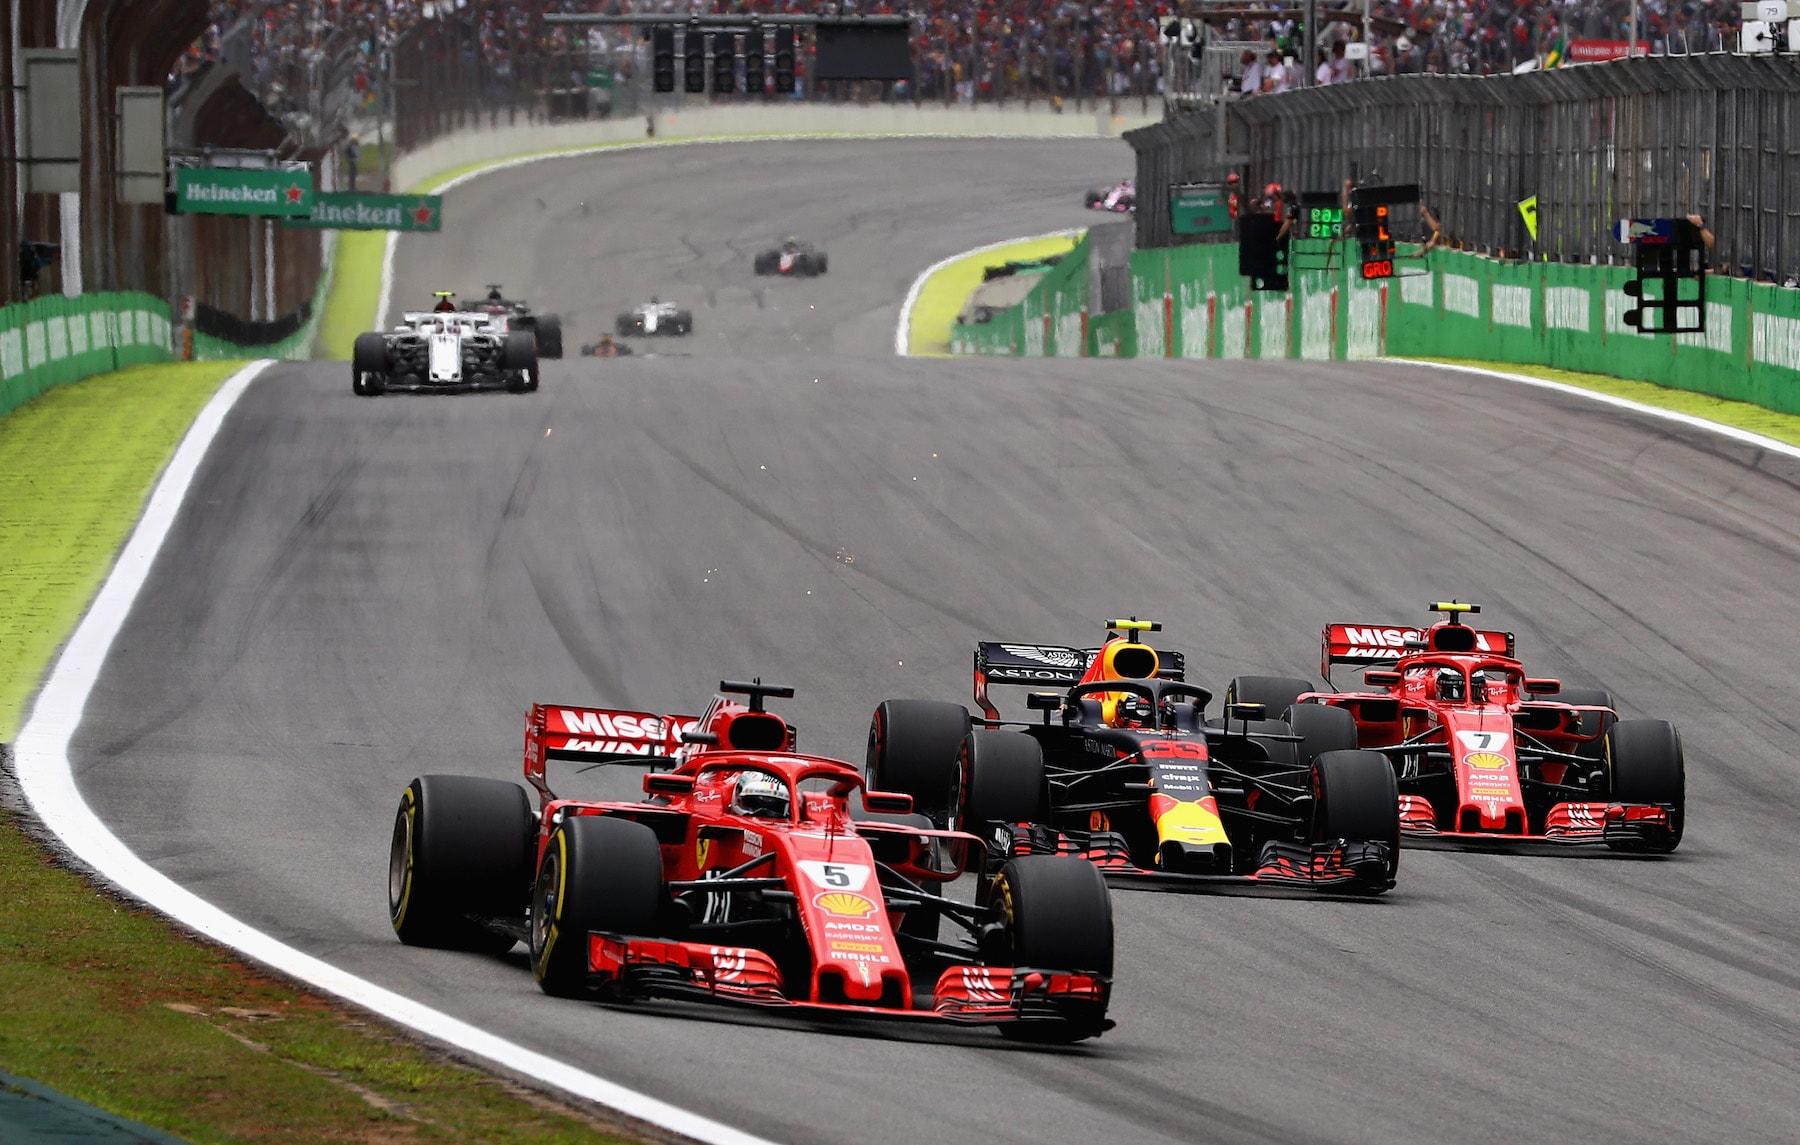 D 2018 Max Verstappen passing Vettel | 2018 Brazilian GP P2 3 copy.jpg